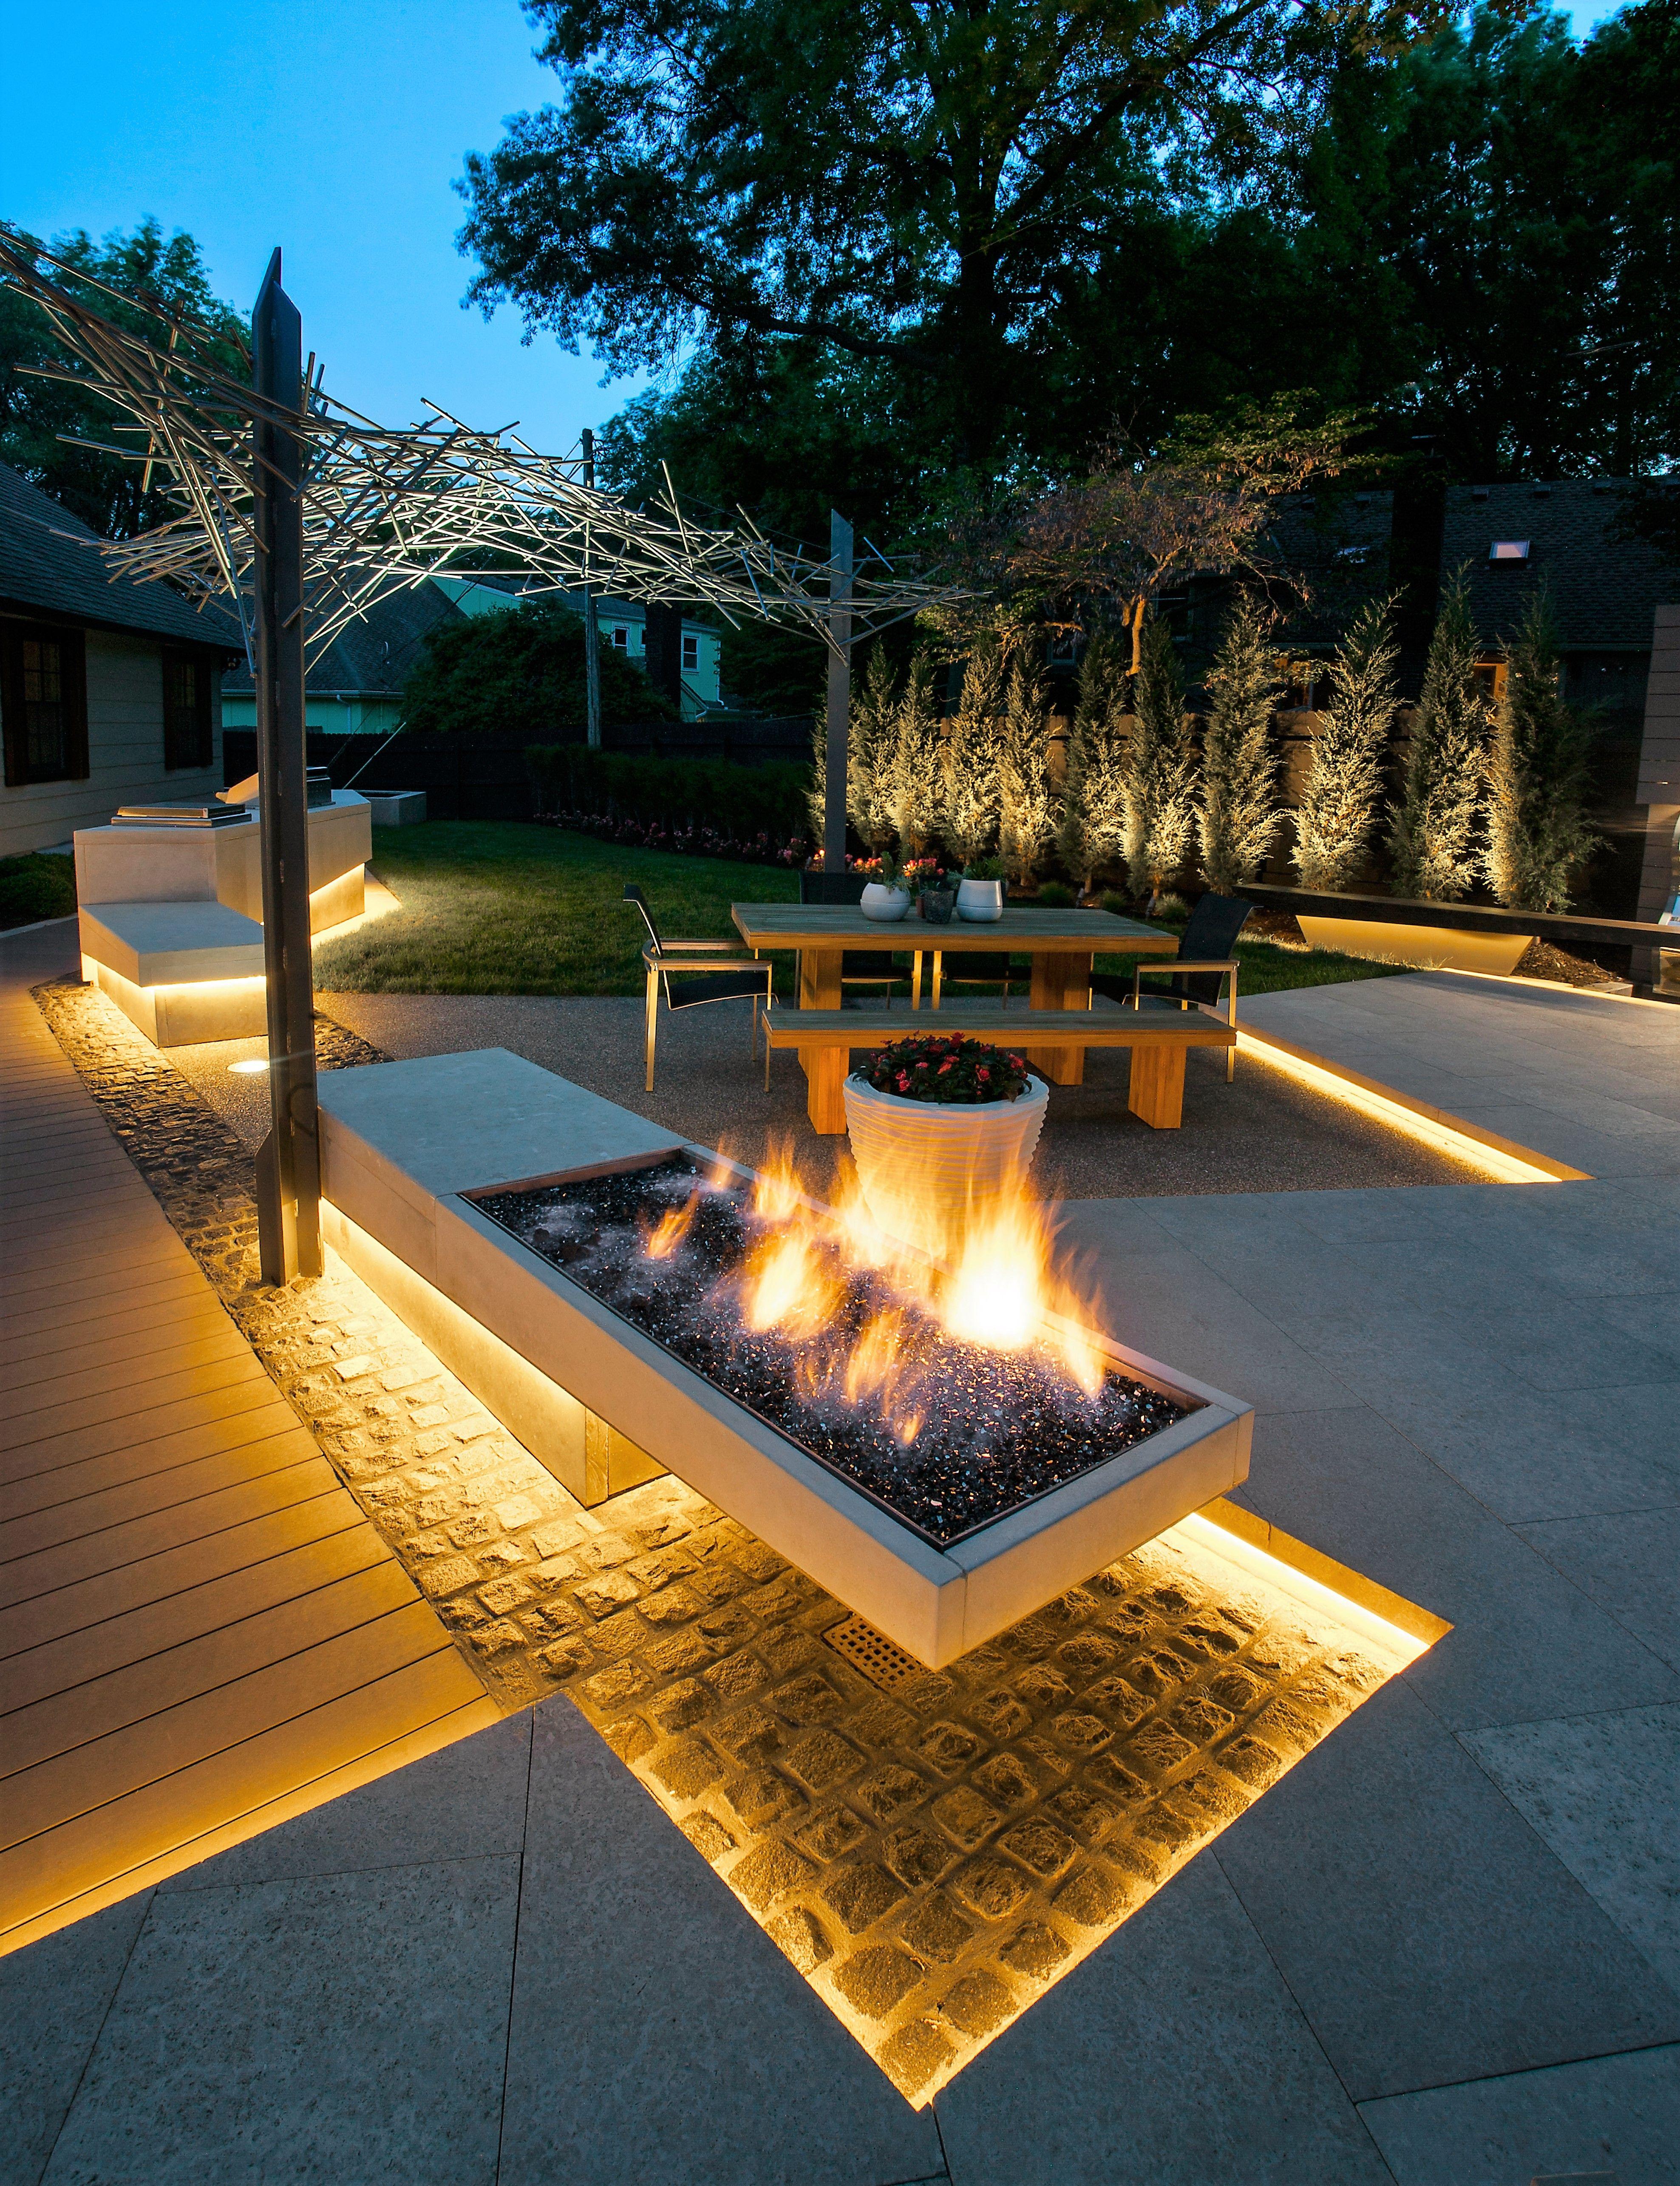 Canterlevered fire pit Modern backyard, Backyard fire